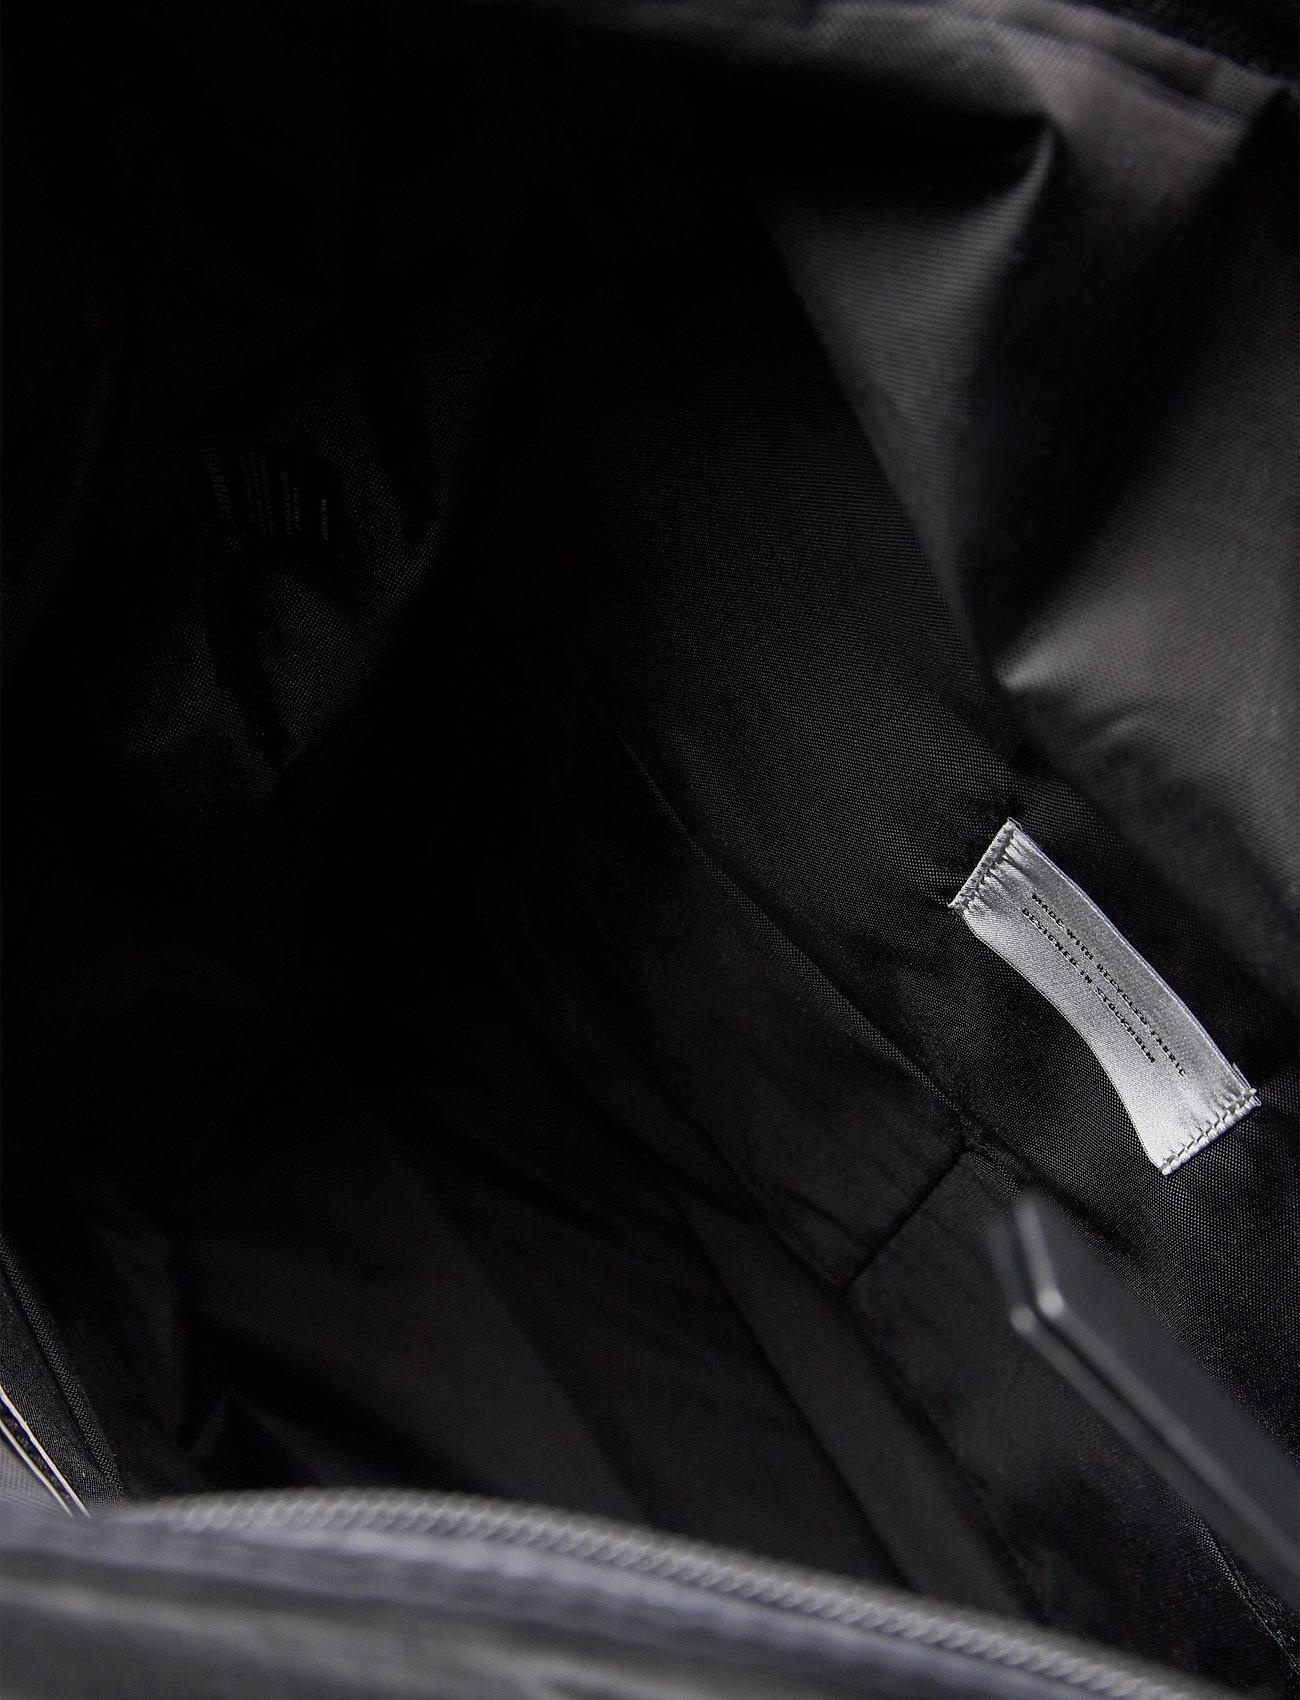 SANDQVIST - SIV - nieuwe mode - black with black leather - 6